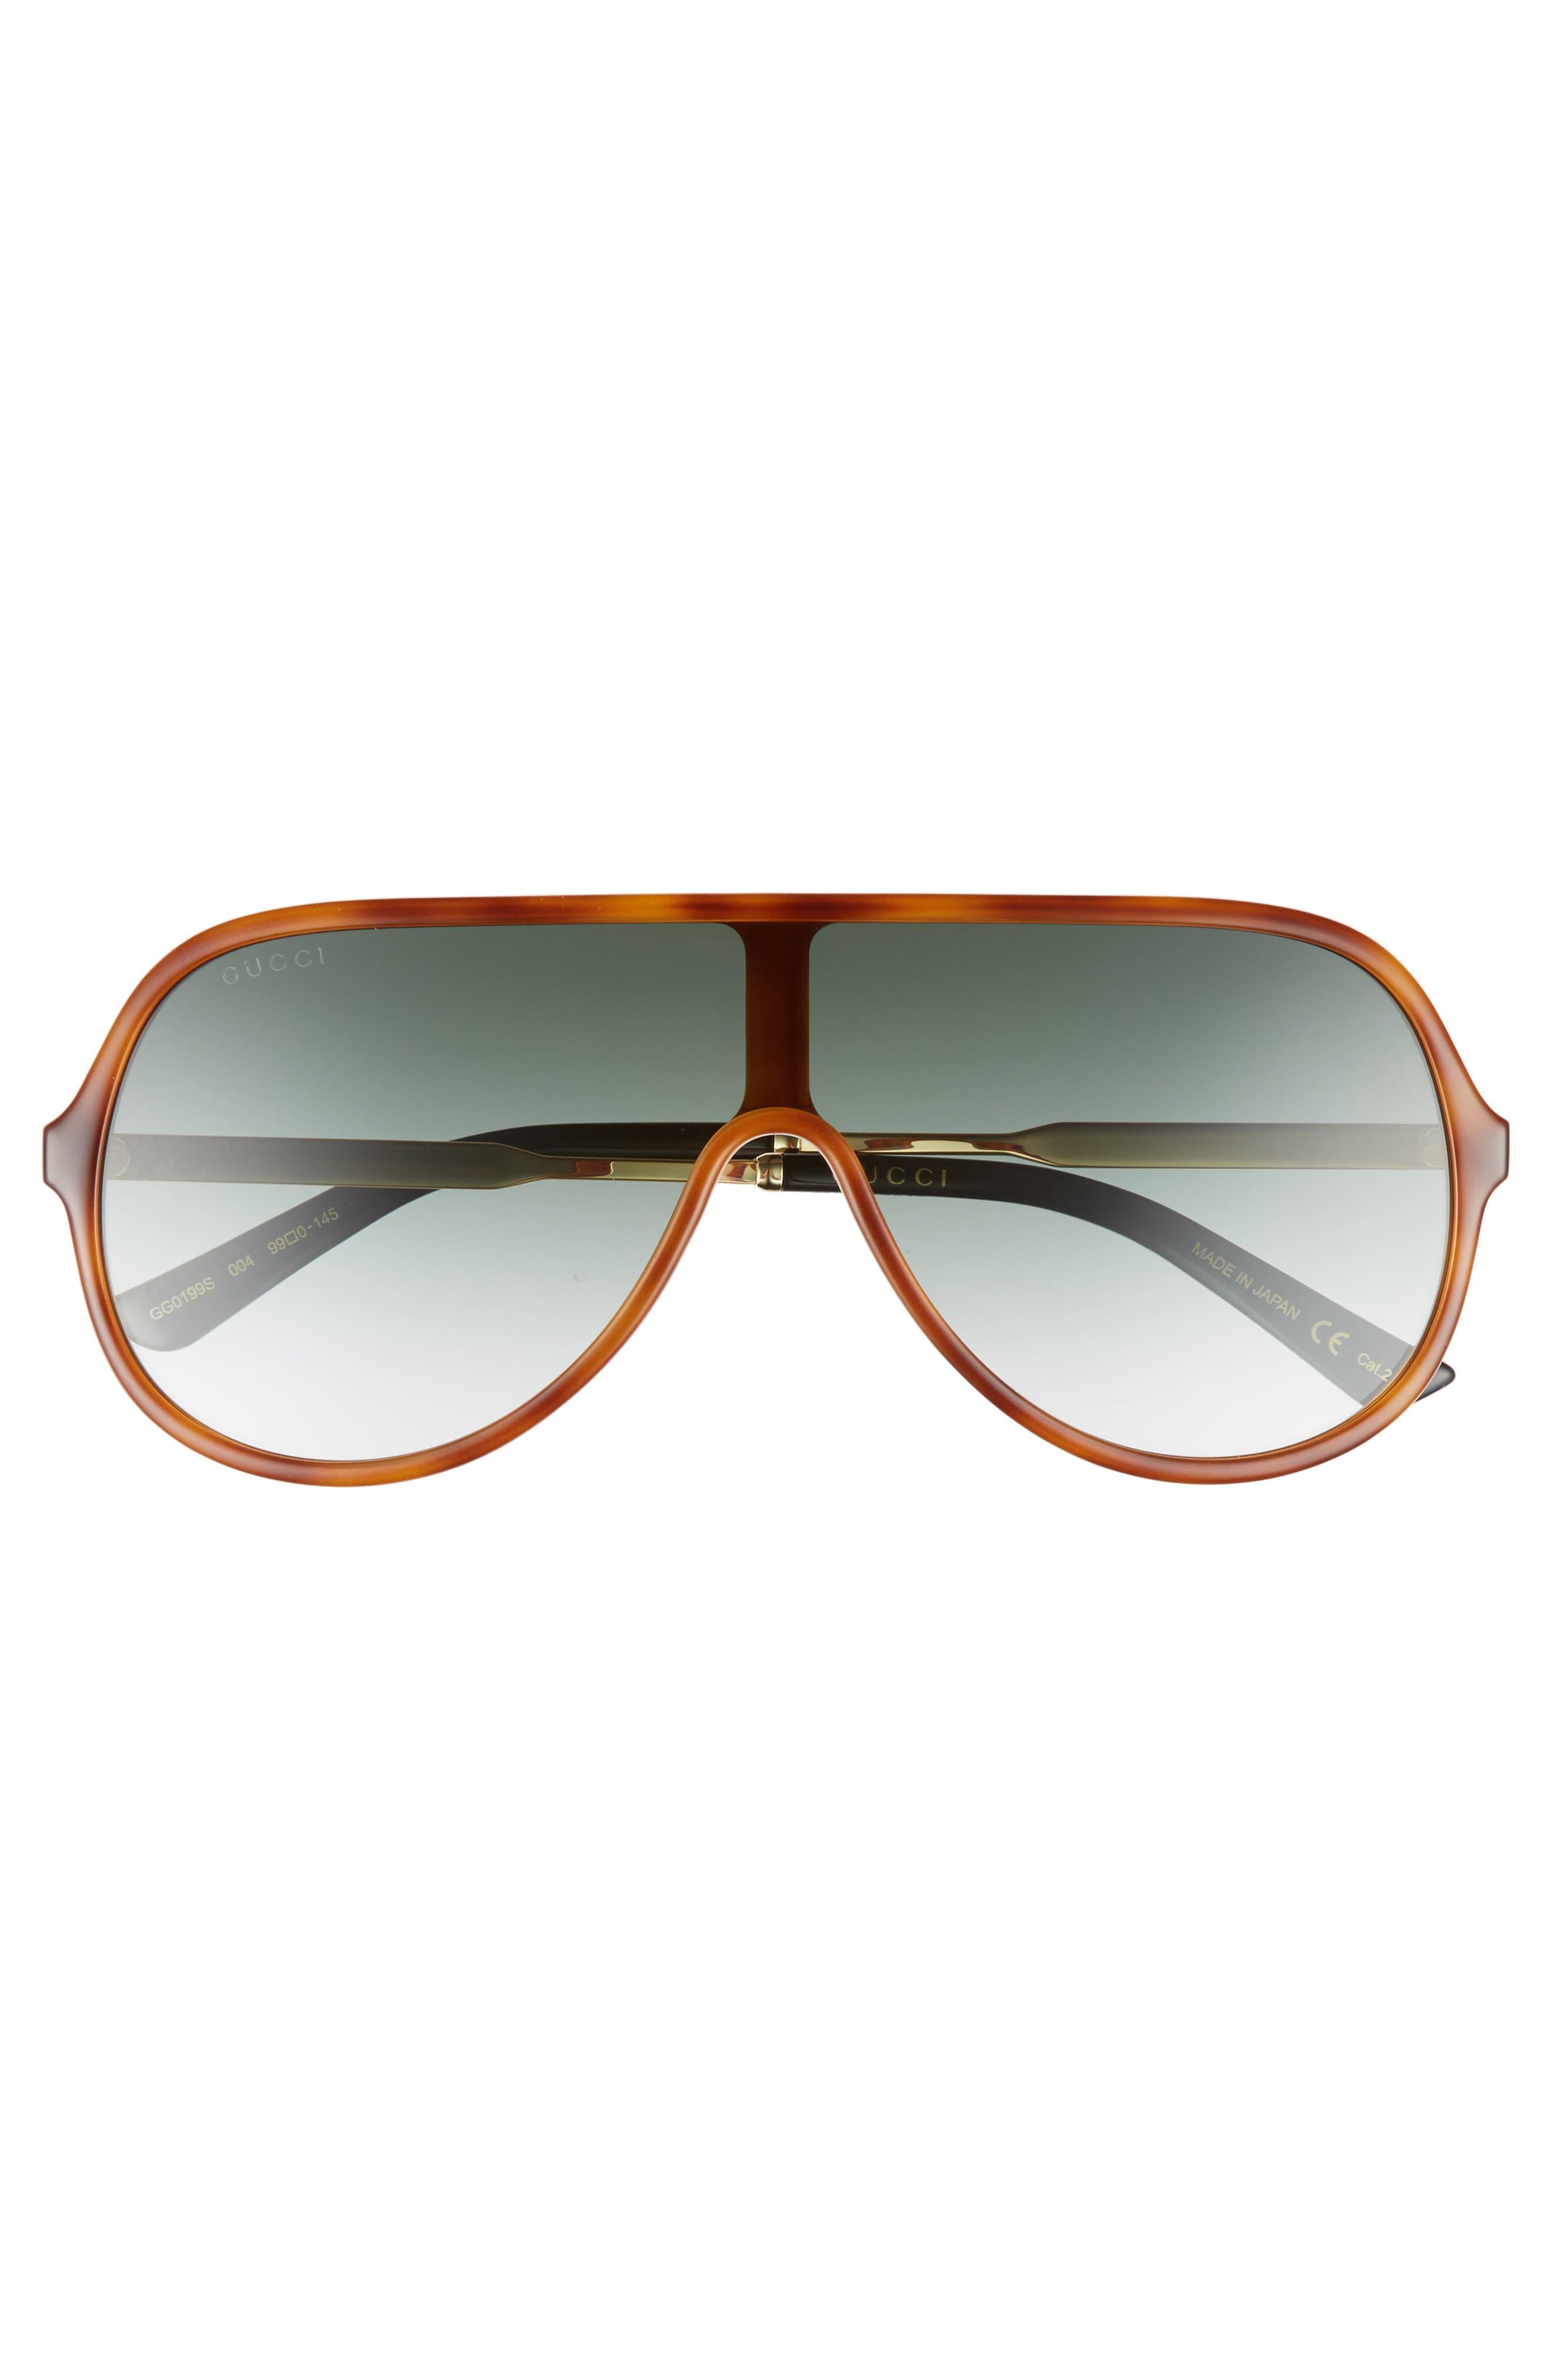 Alternate Image 2  - Gucci 99mm Oversize Shield Sunglasses